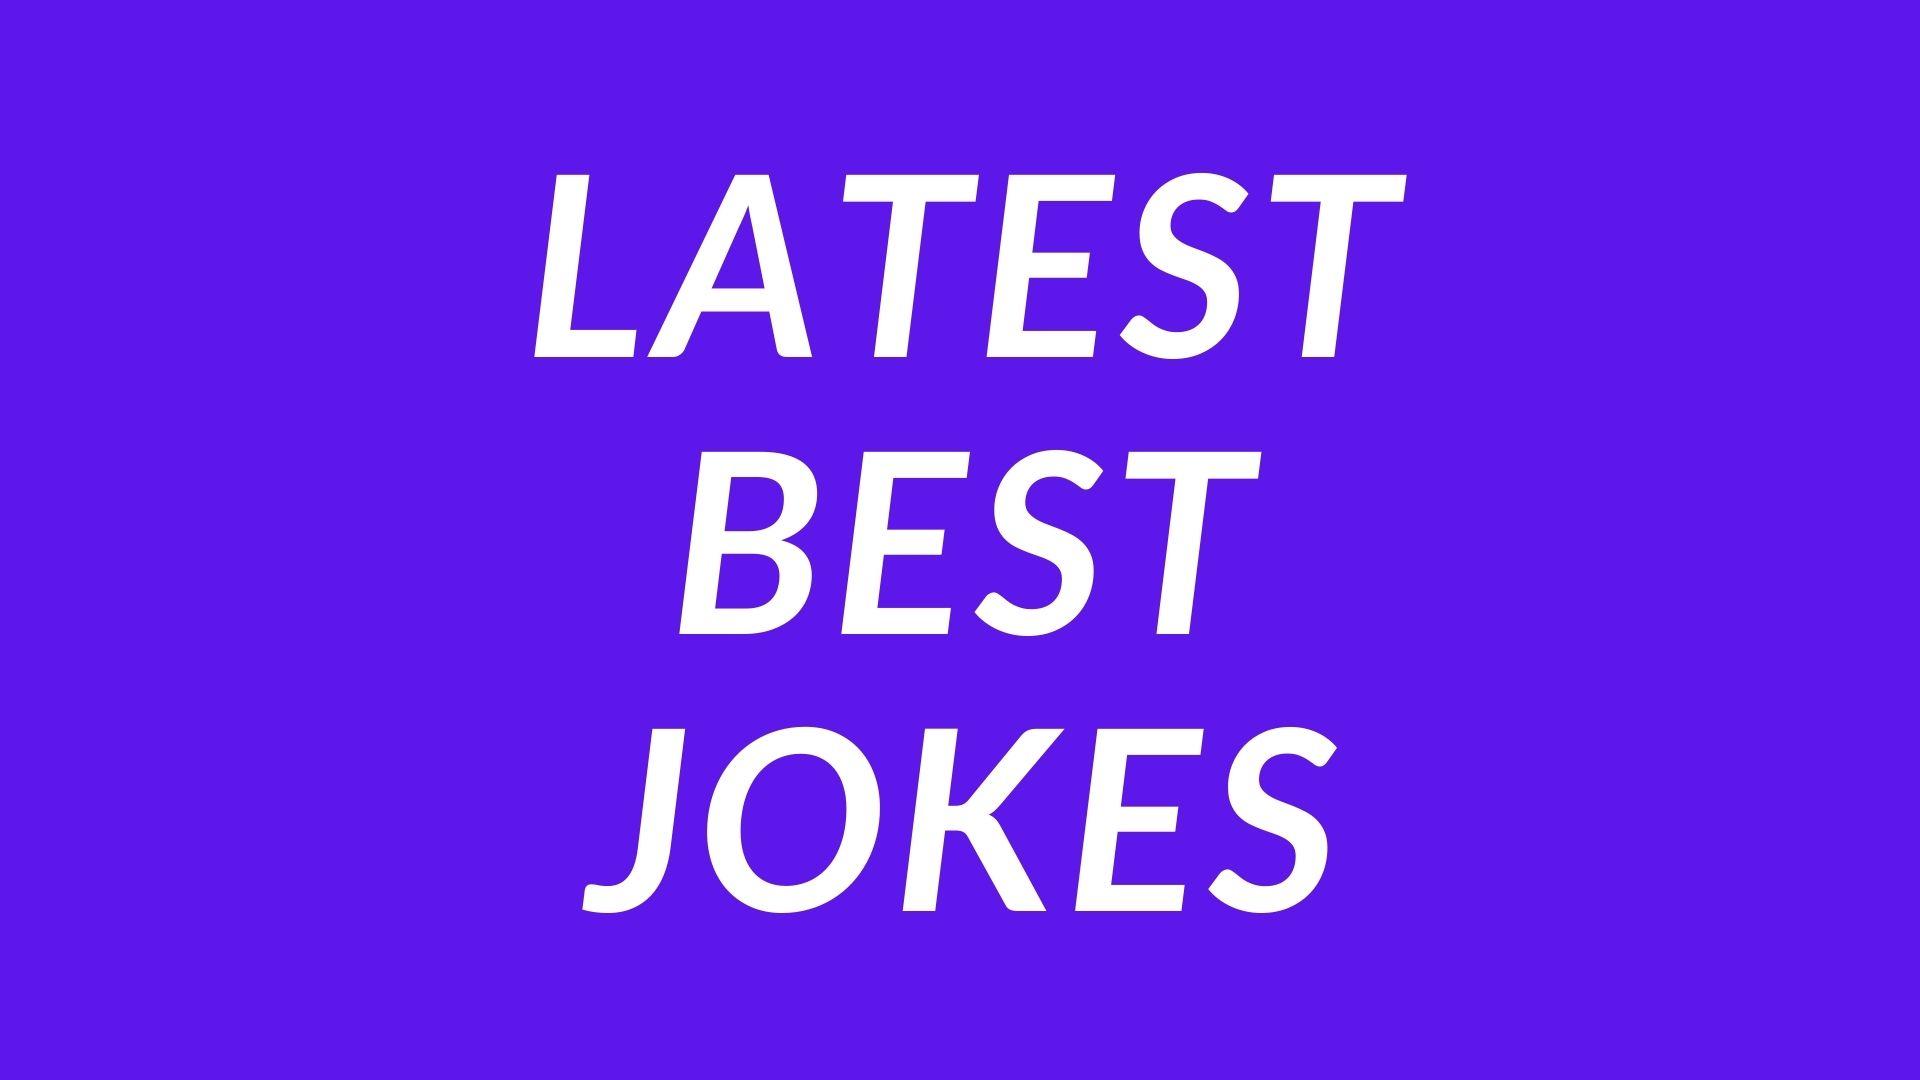 joke image